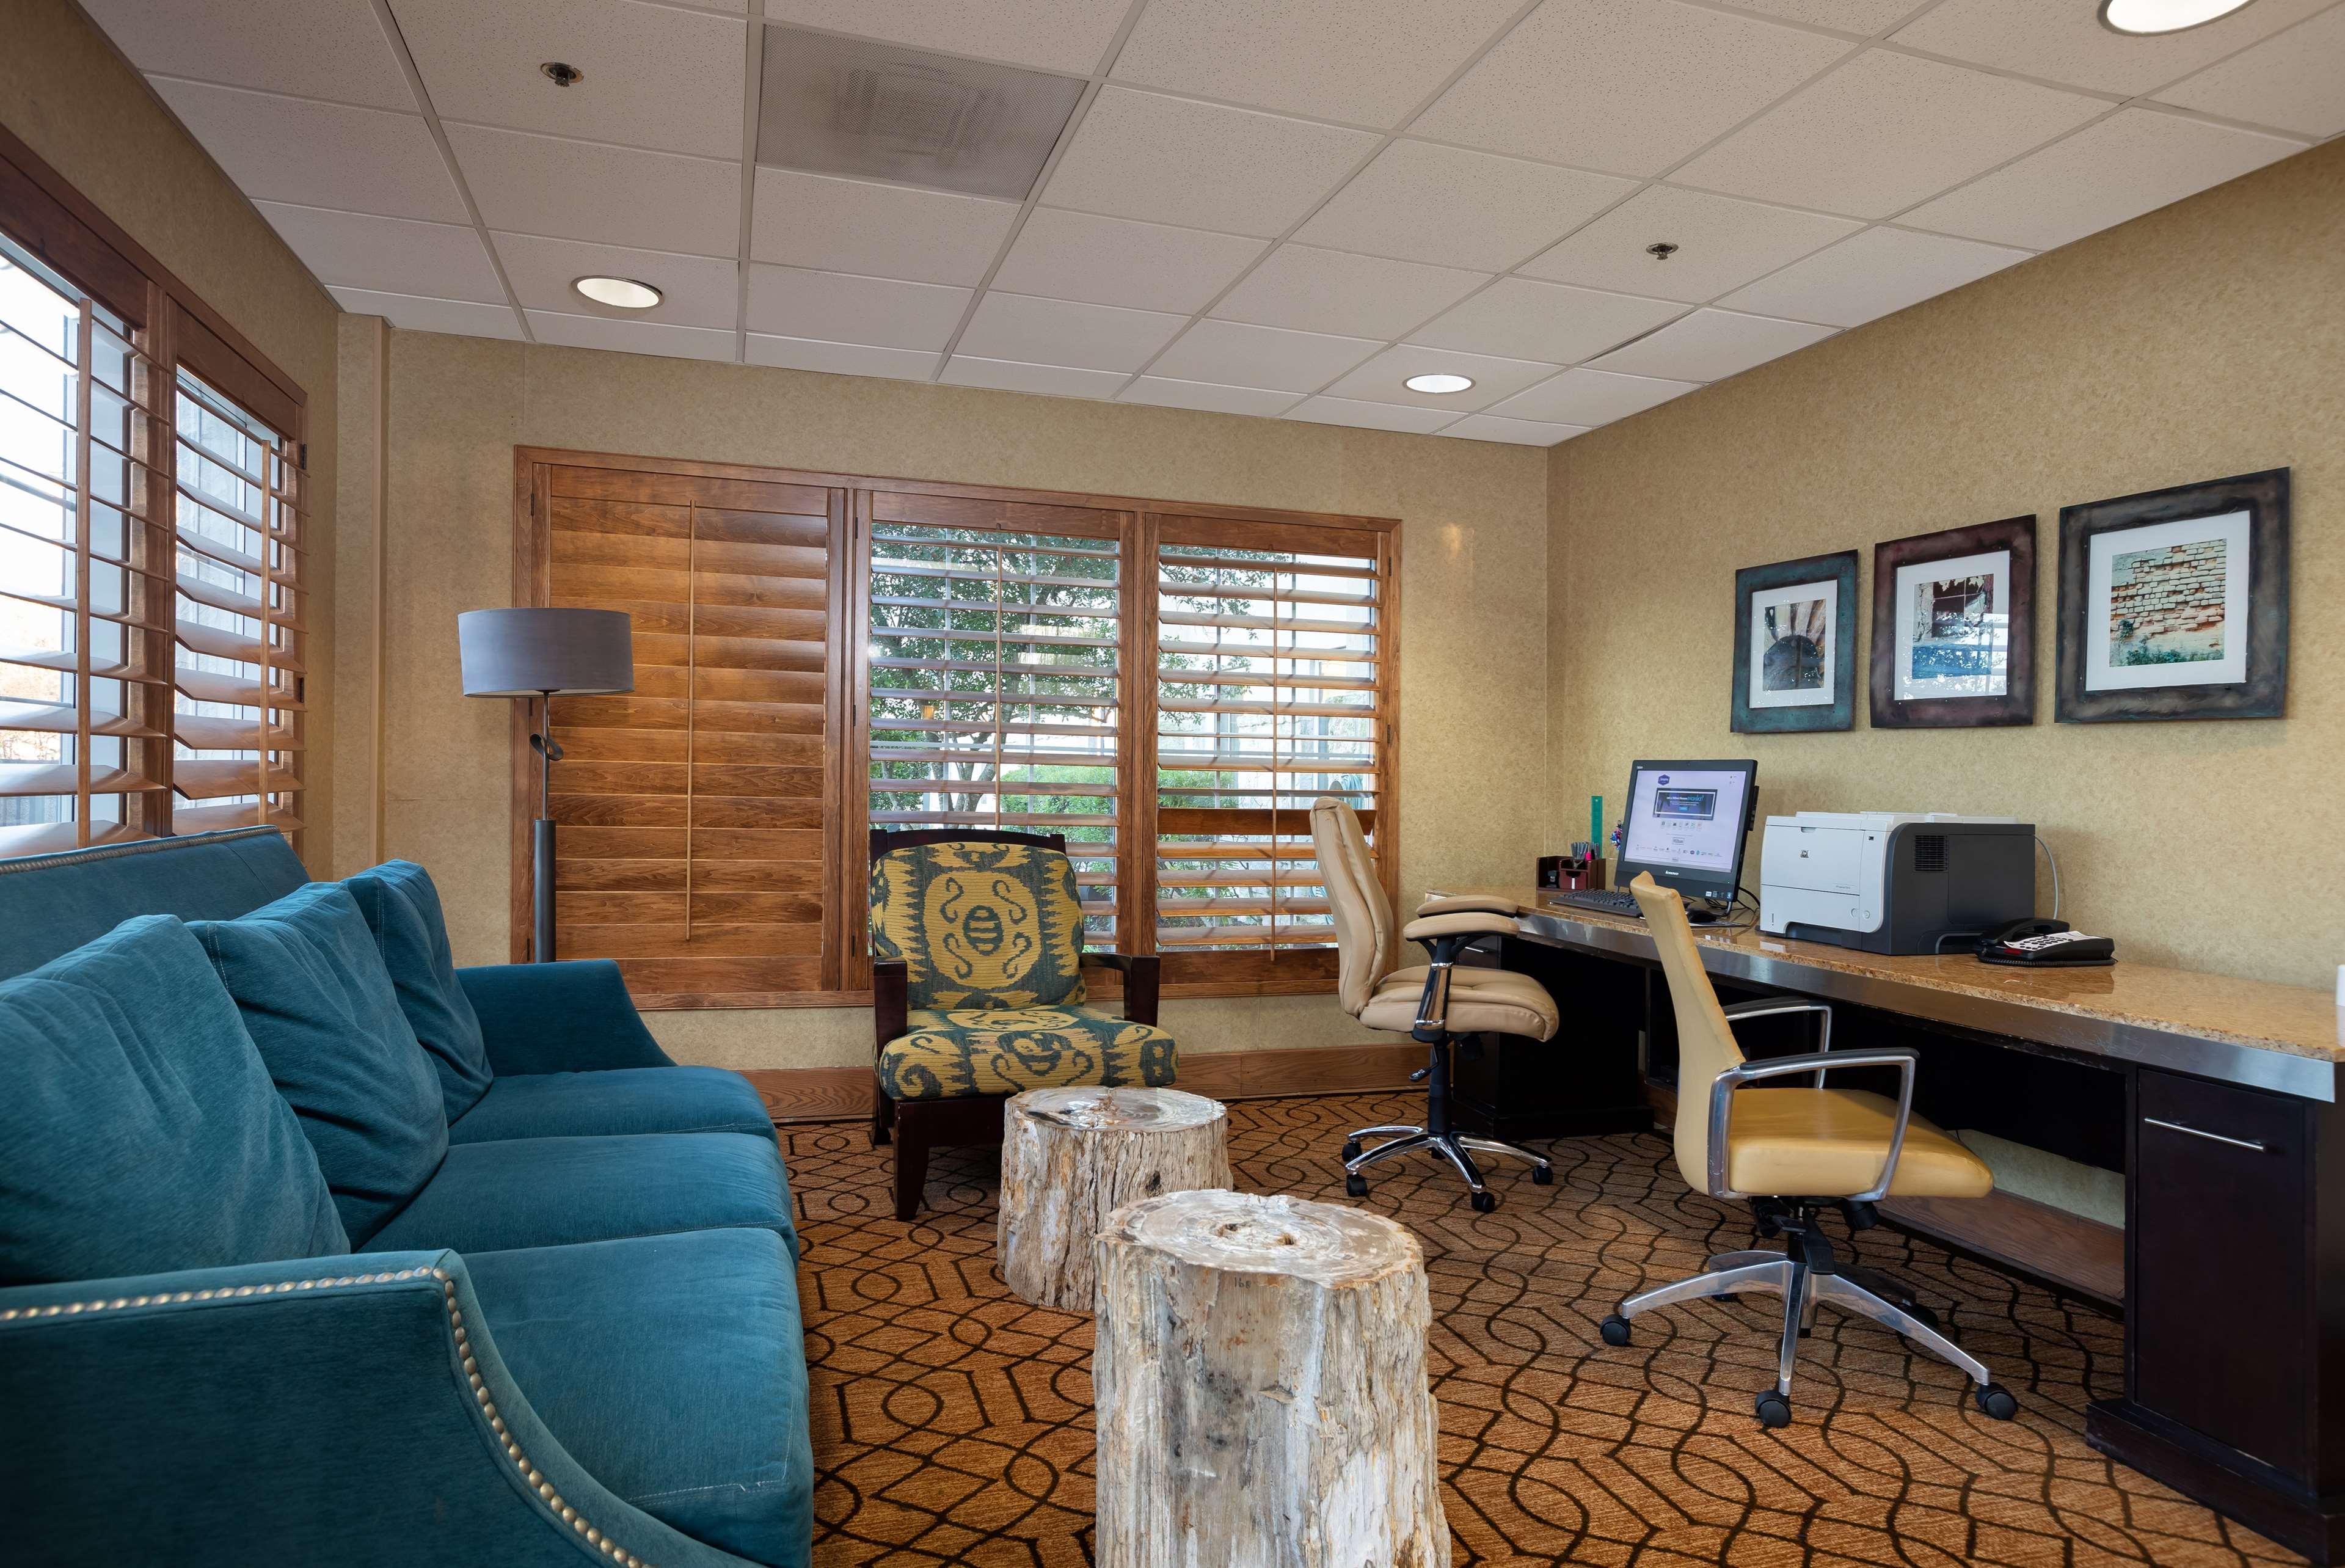 Hampton Inn & Suites Austin-Airport image 45